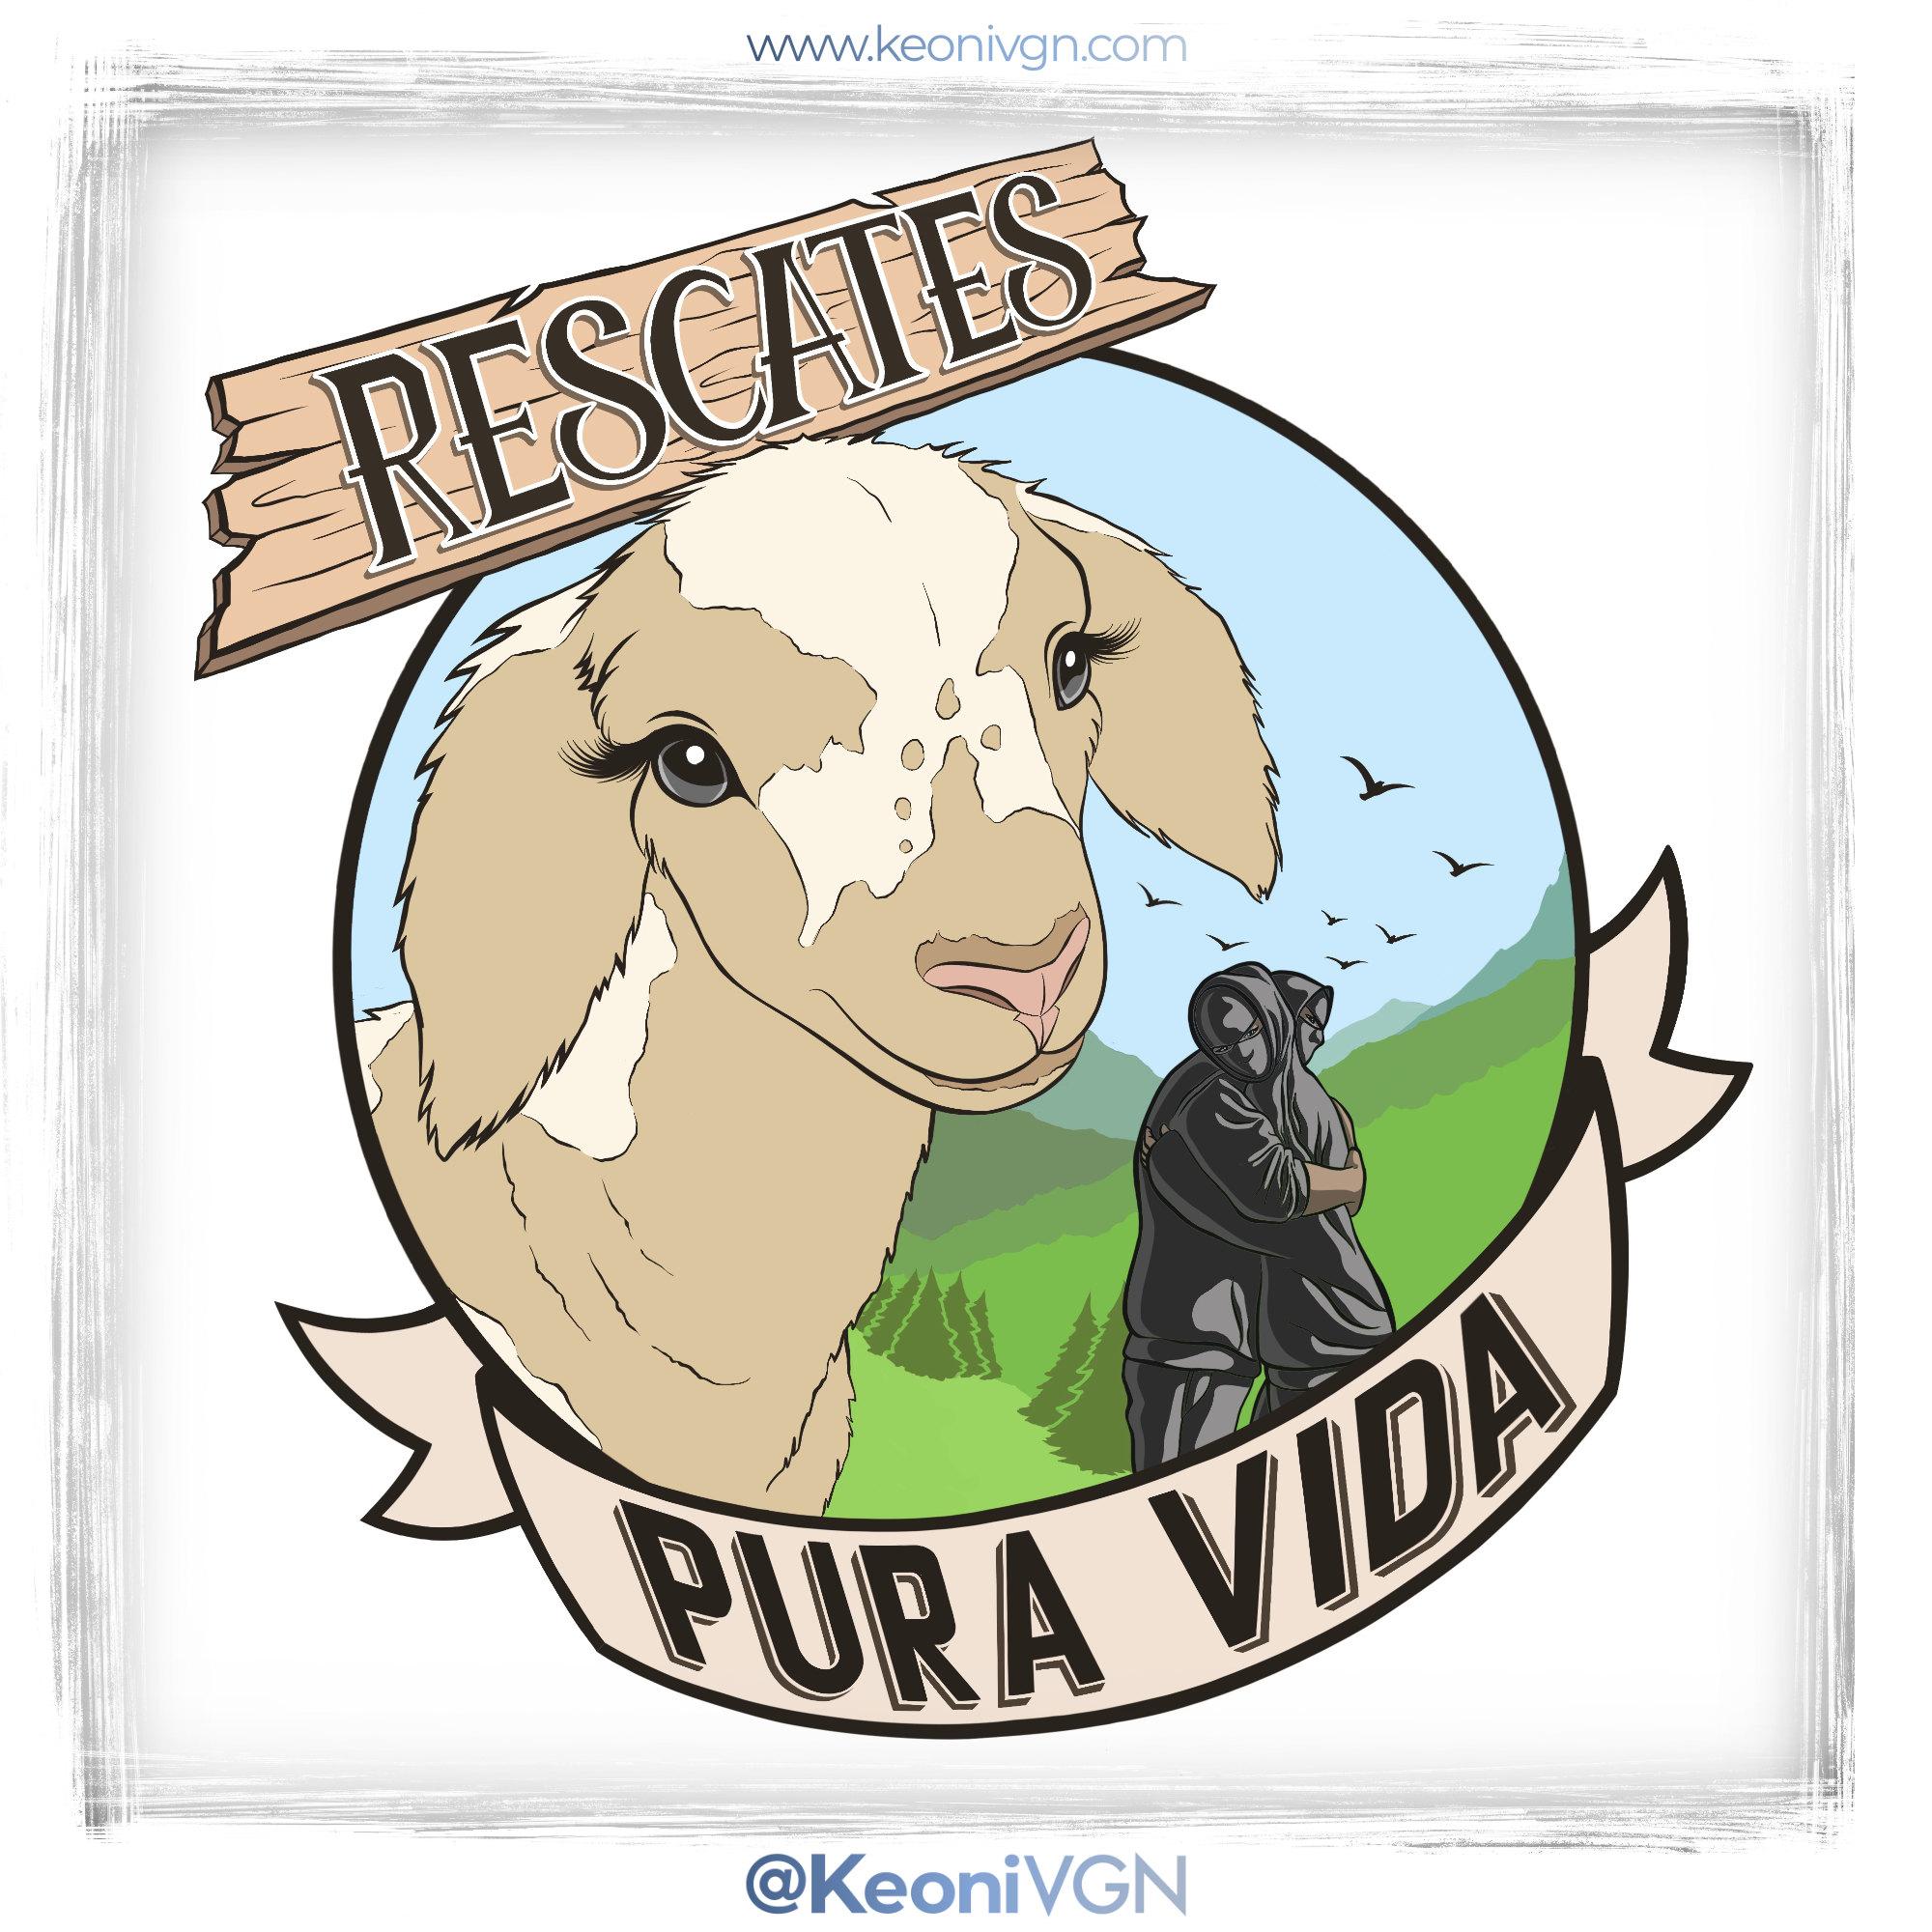 proyecto PURA VIDA